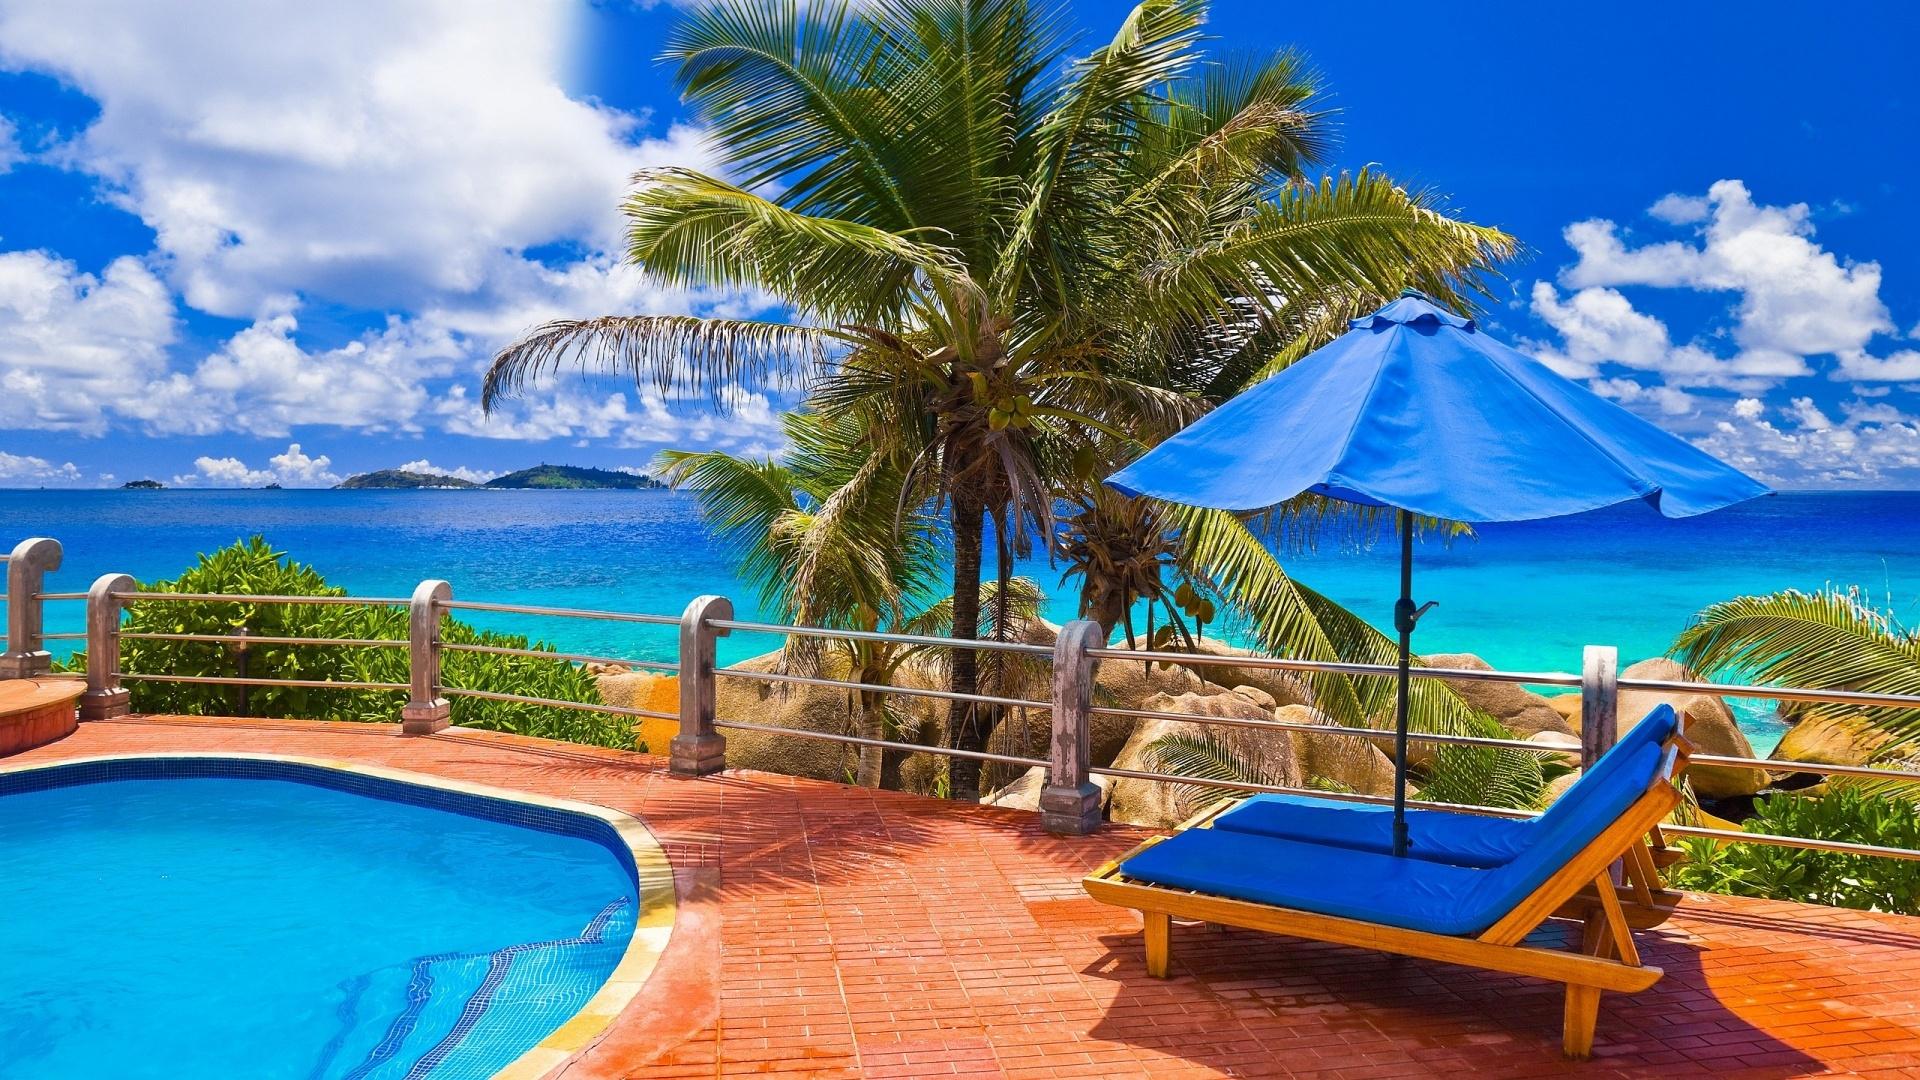 Caribbean Wallpaper · Caribbean Wallpaper · Caribbean Wallpaper · Caribbean Wallpaper ...